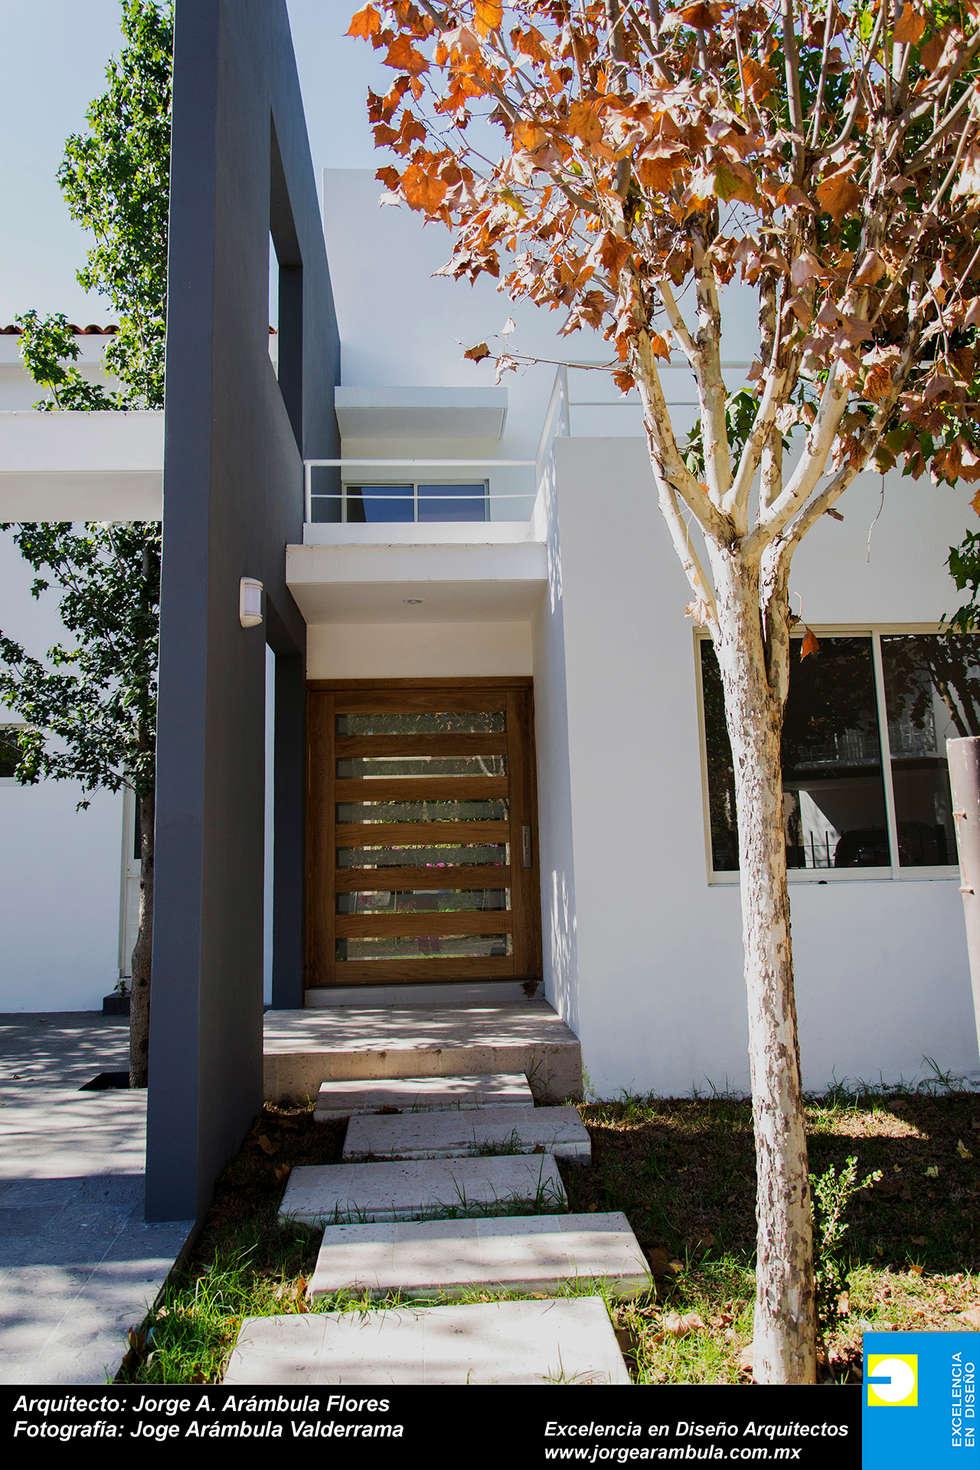 36 Dise Os De Entradas Que Se Ver N Perfectas En Casas No Muy Grandes ~ Decoracion De Entradas De Casas